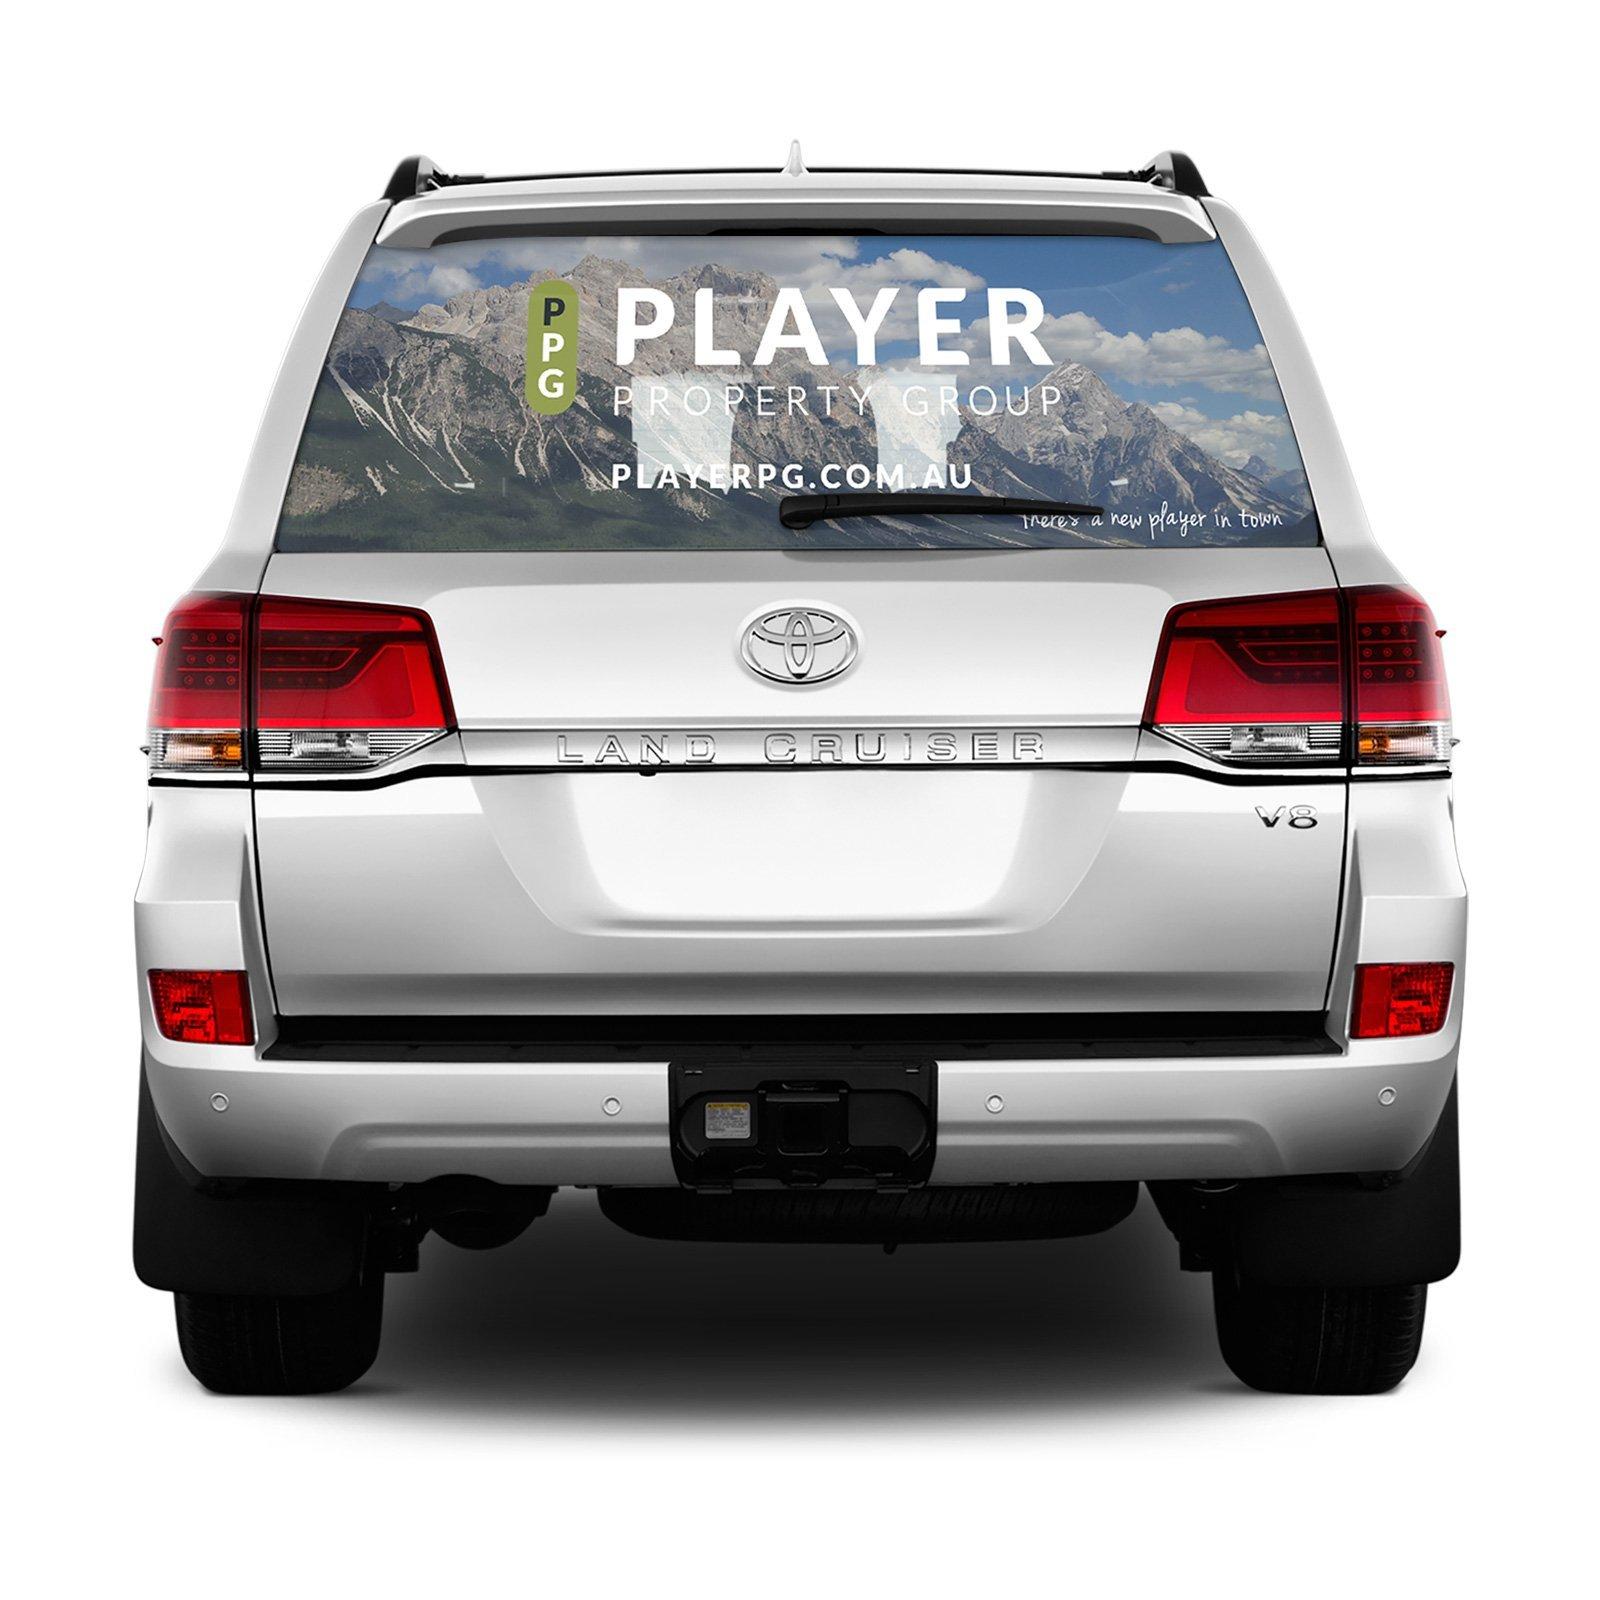 Player Property Group Car Wrap